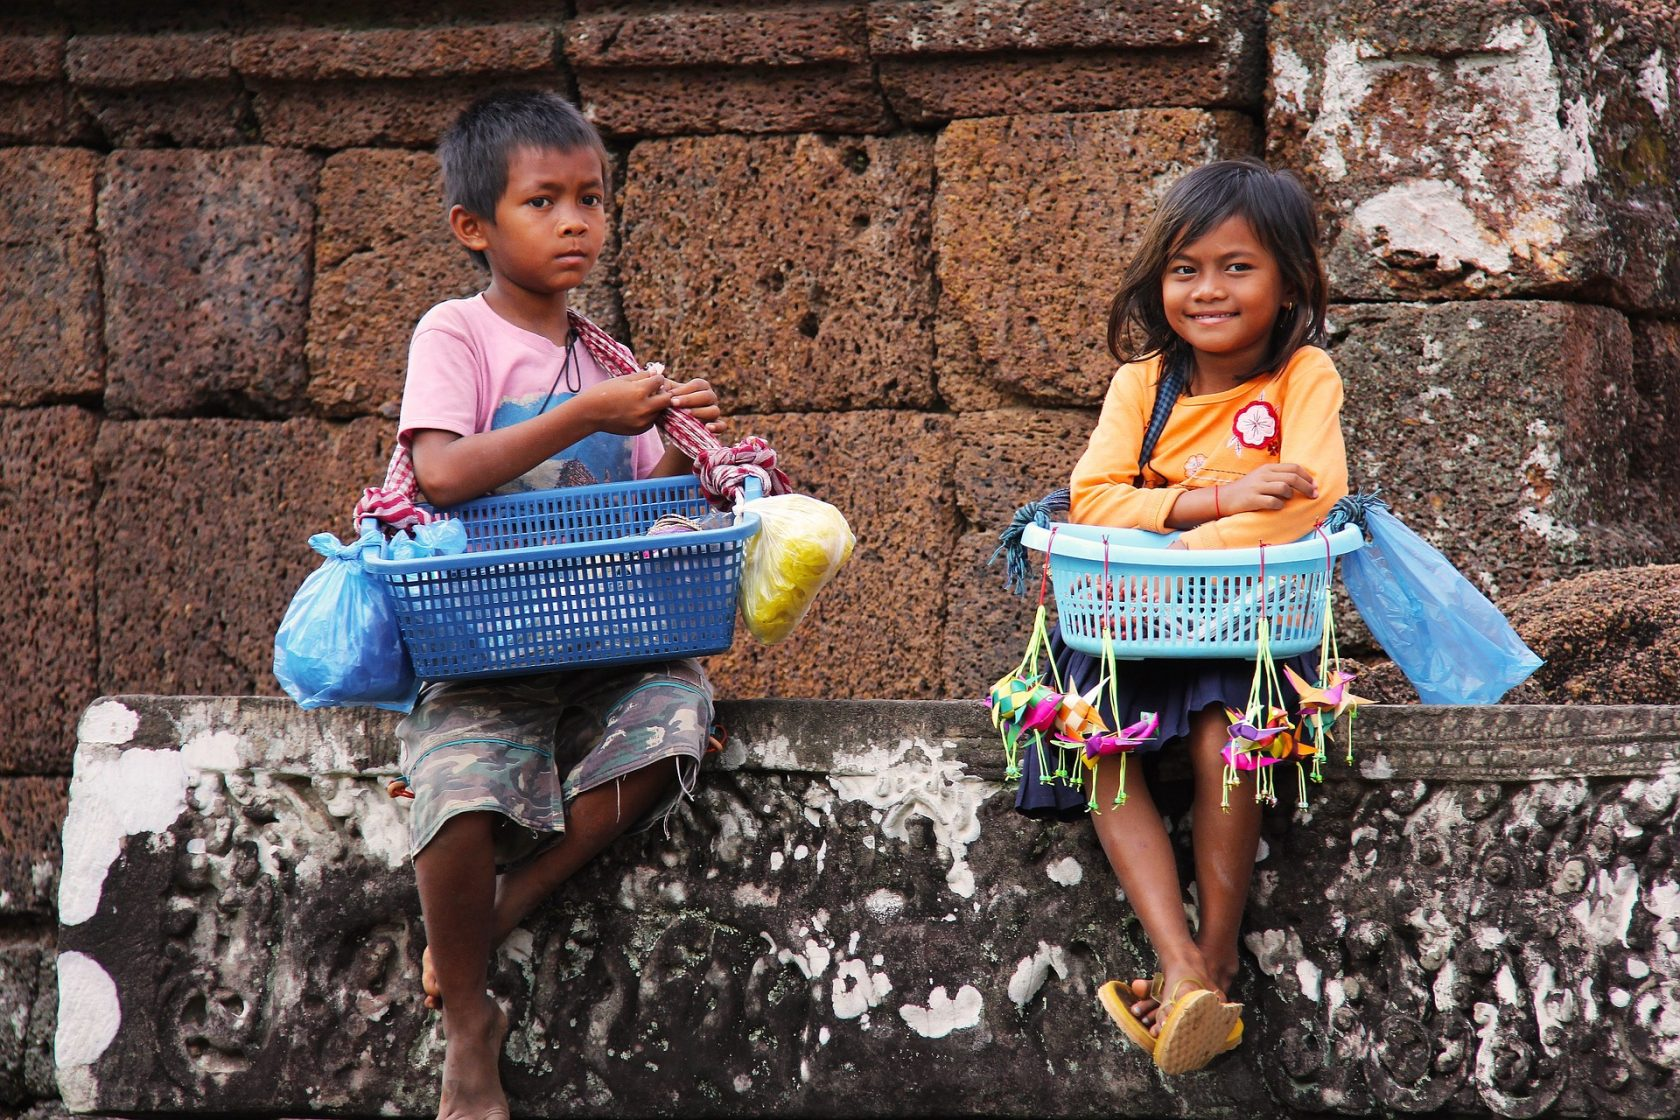 Privatreise, private Rundreise Kambodscha: Kinder in Angkor